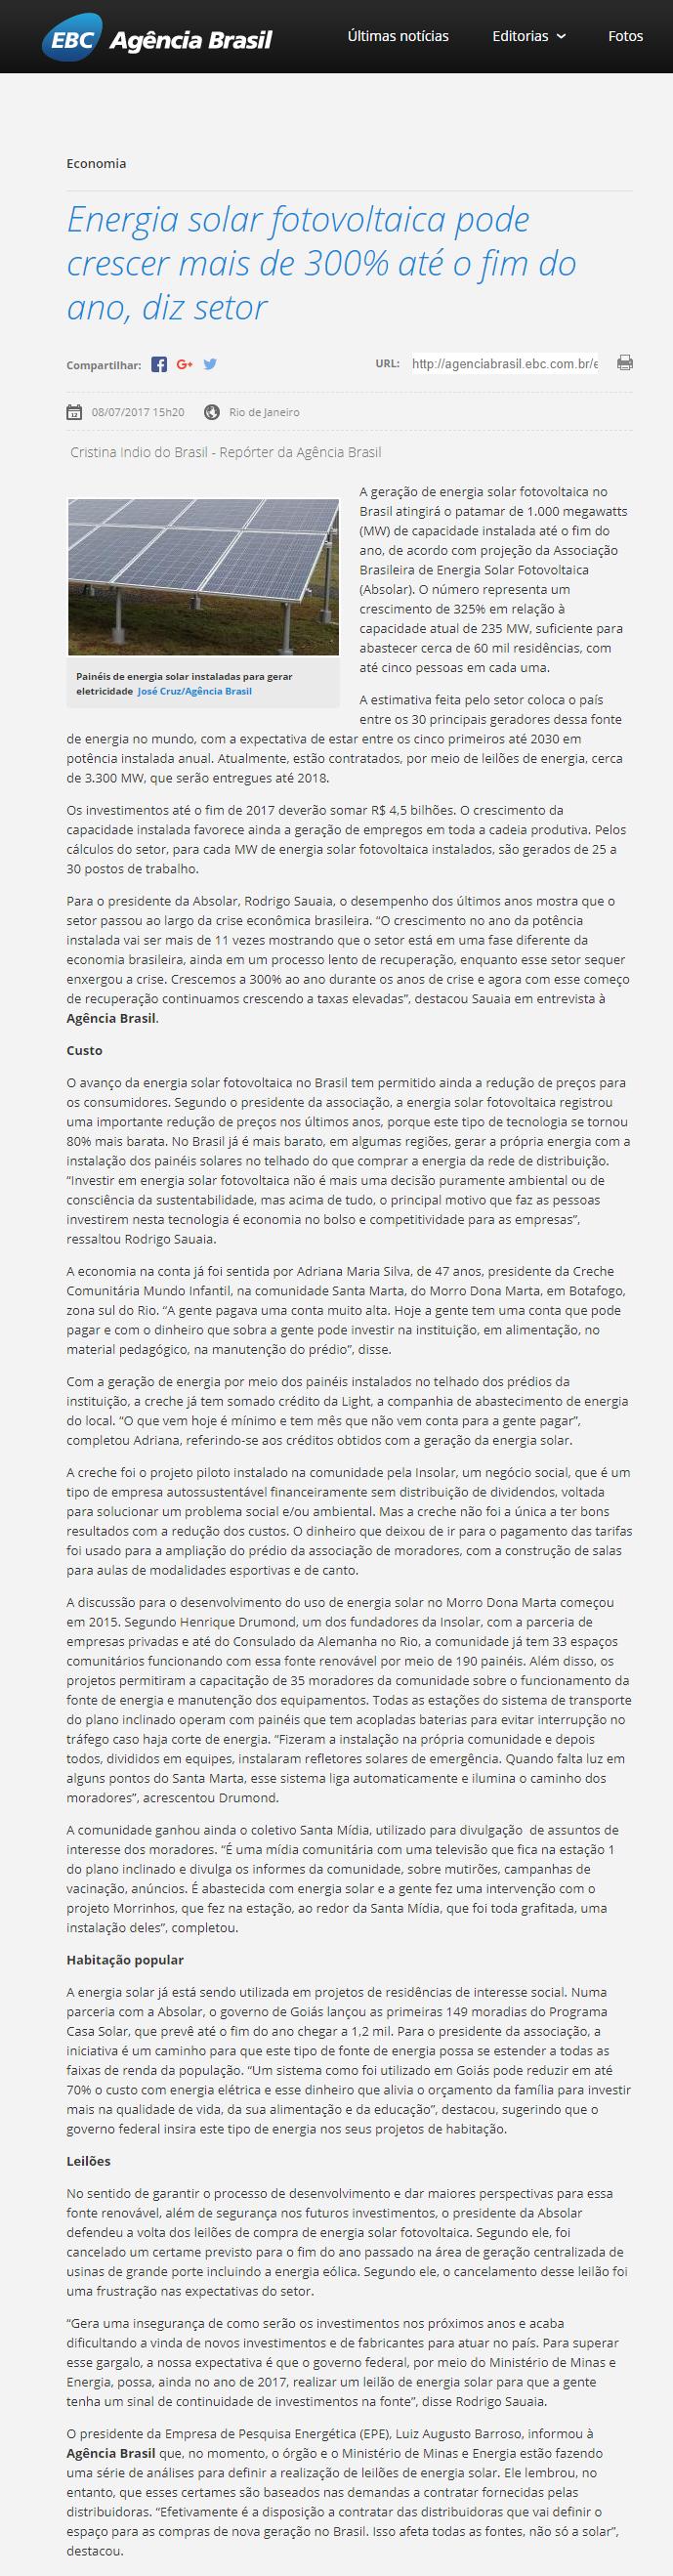 Lara absolar agencia brasil 2